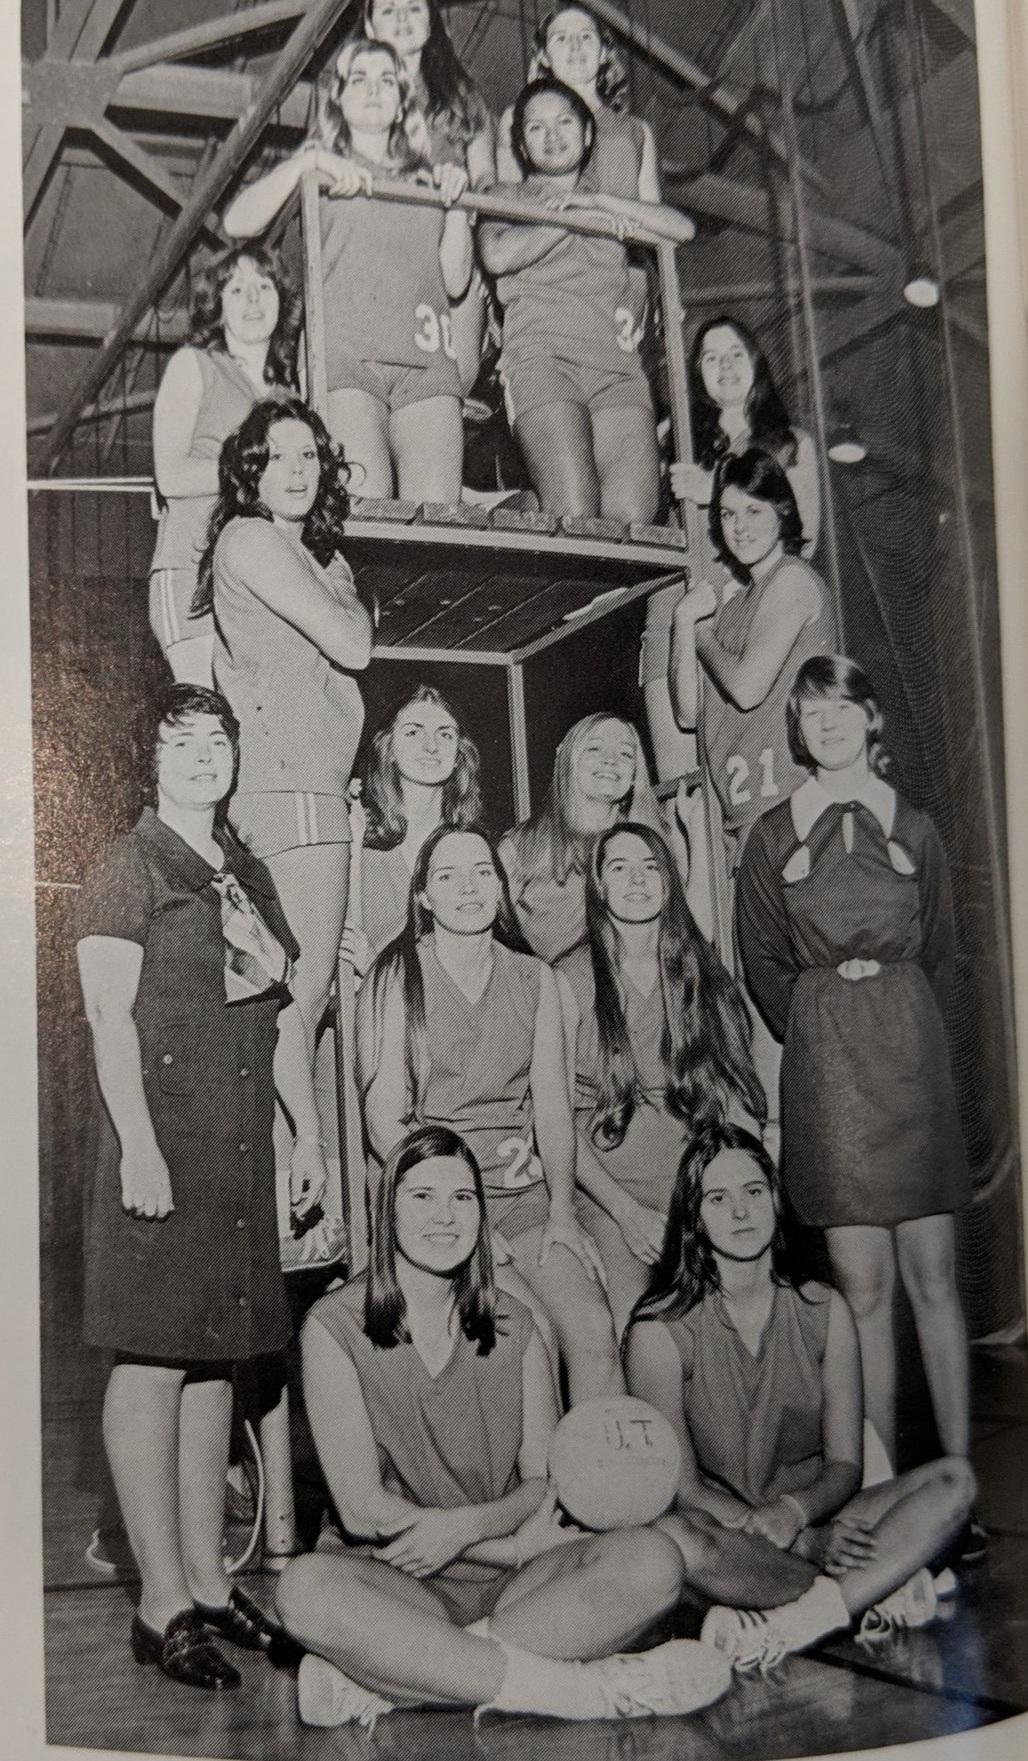 1972 UTSA Basketball Coach Spearman far left